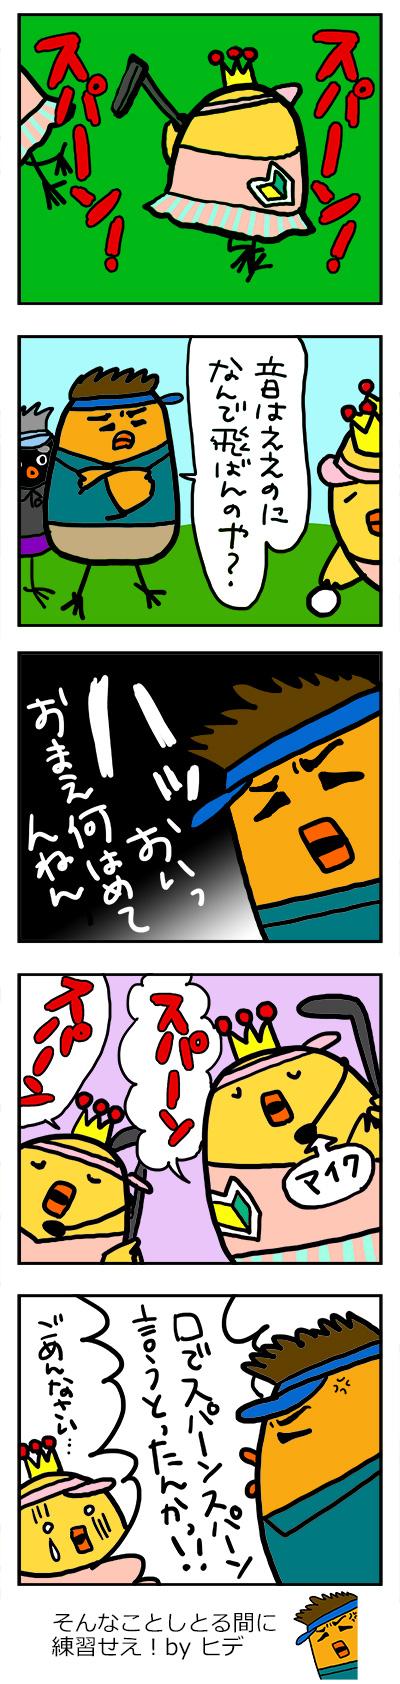 10_hina2